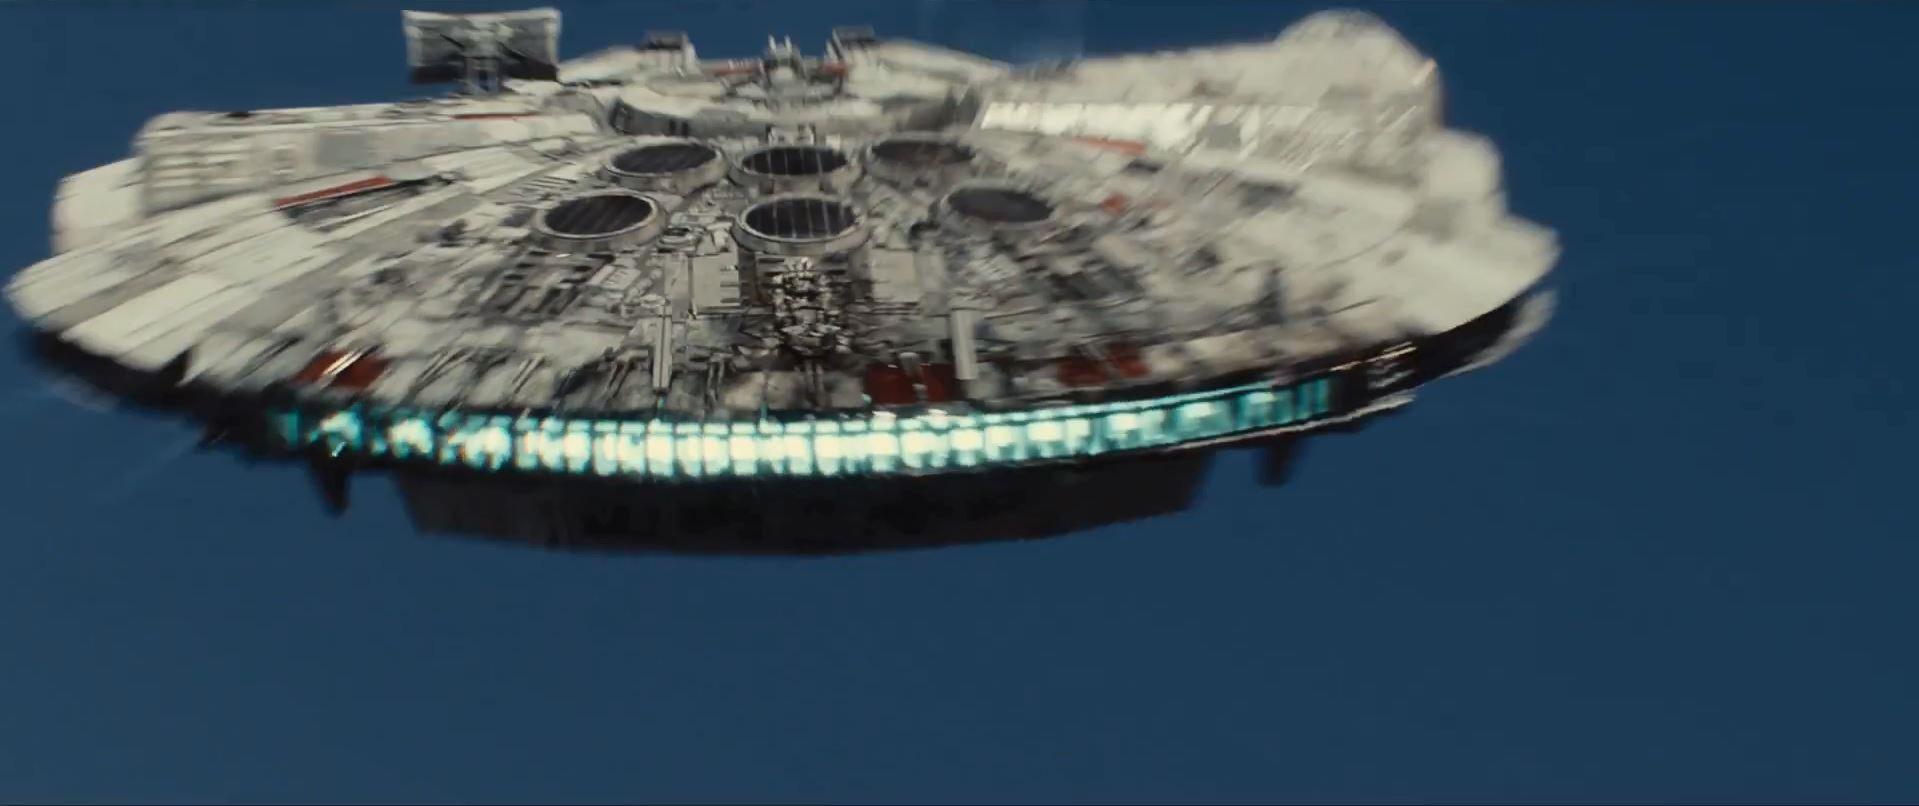 New Millennium Falcon - Star Wars Episode 7 trailer released